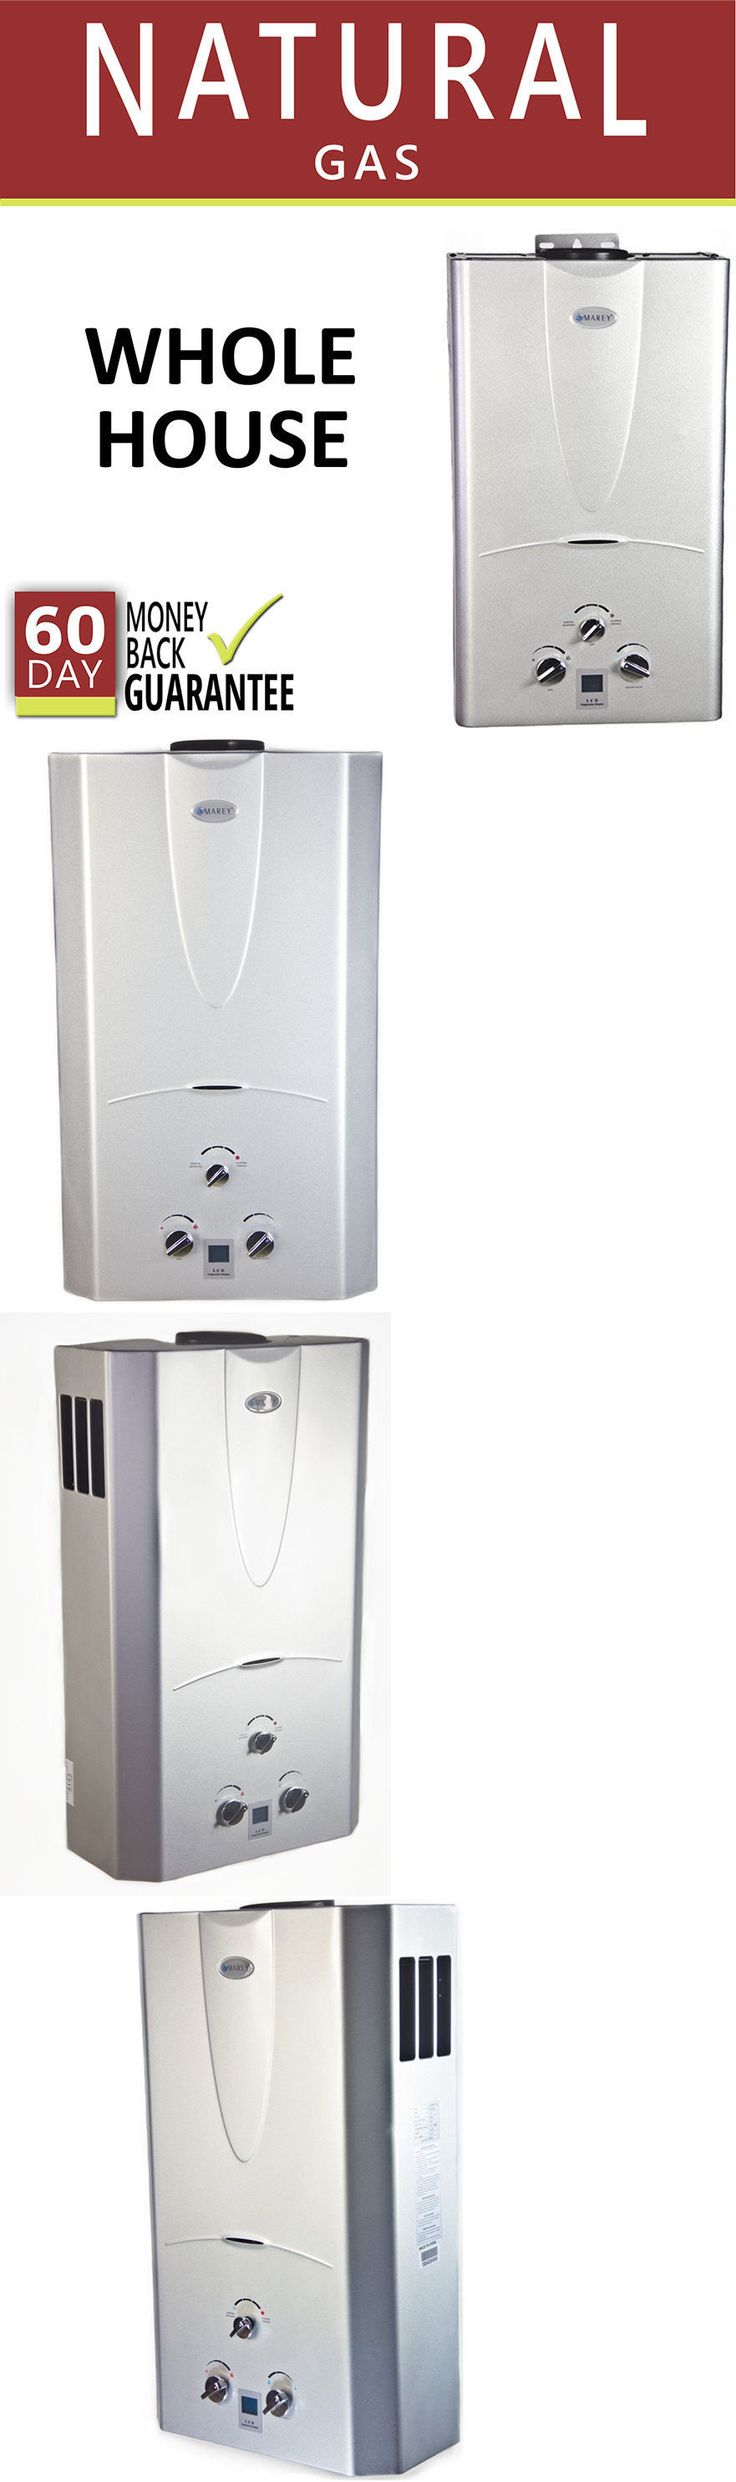 Whole House Water Heater Mas De 10 Ideas Increa Bles Sobre Natural Gas Water Heater En Pinterest